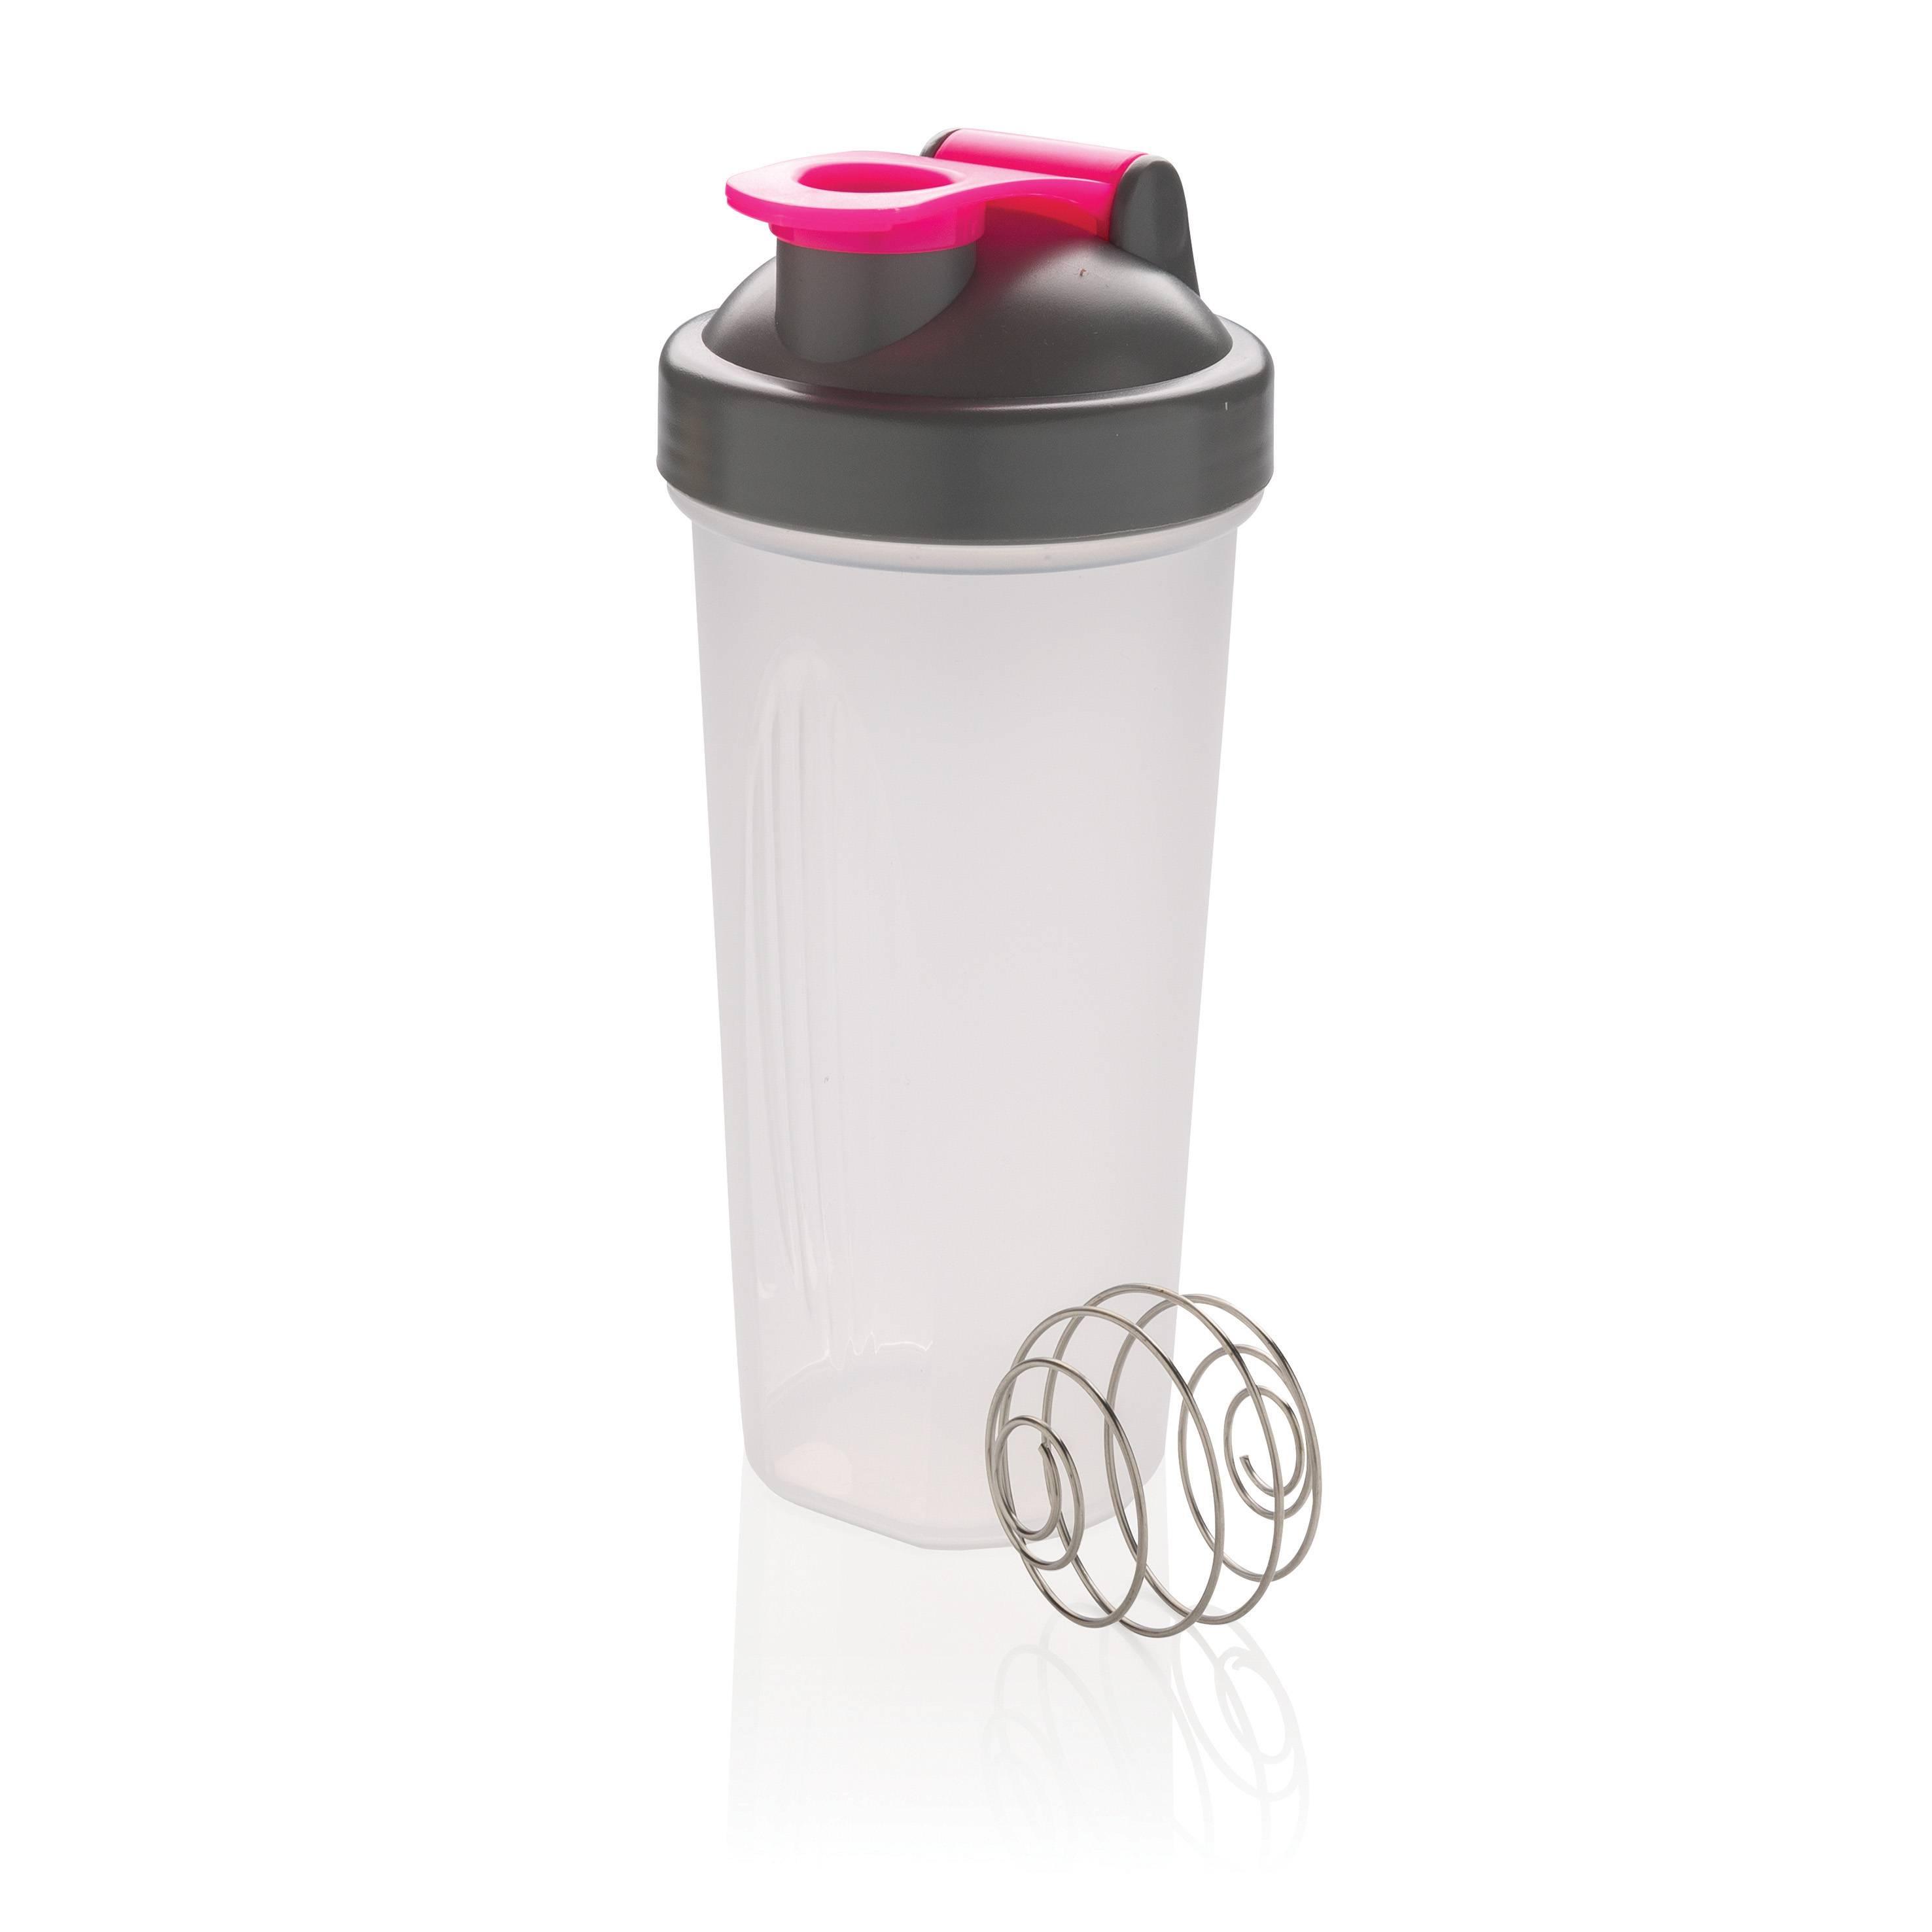 Shakerflaske (Pink)